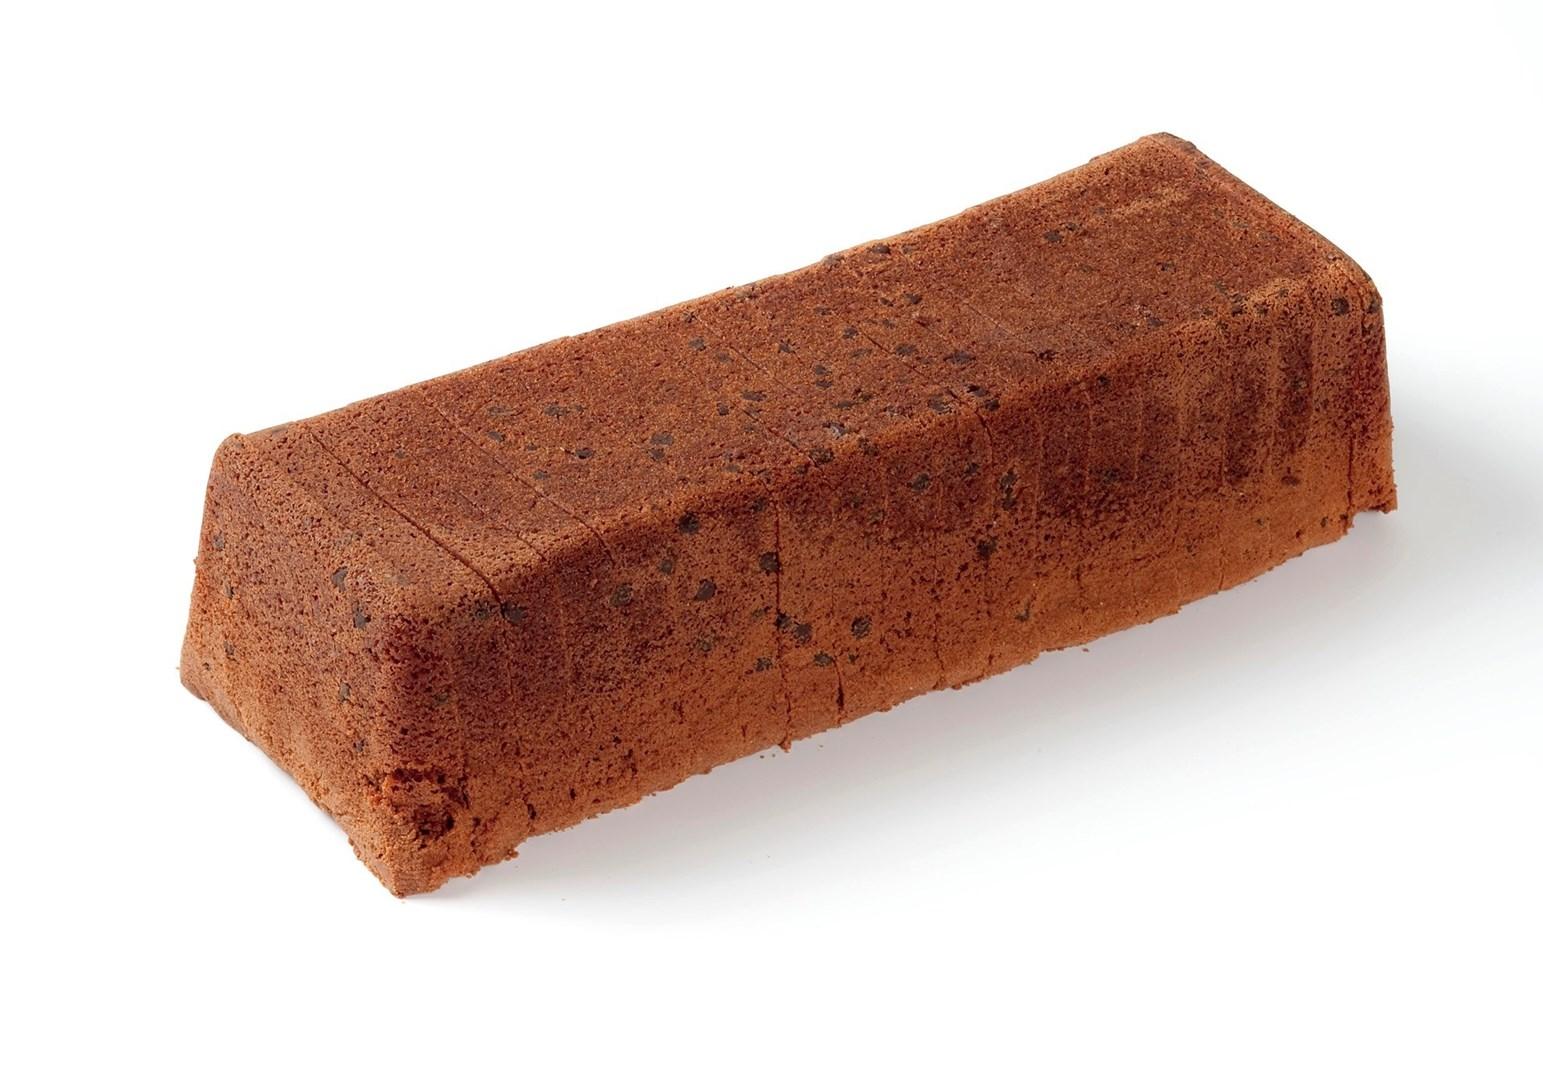 Productafbeelding ROOMBOTER CHOCO.CAKE (18 PLAK)